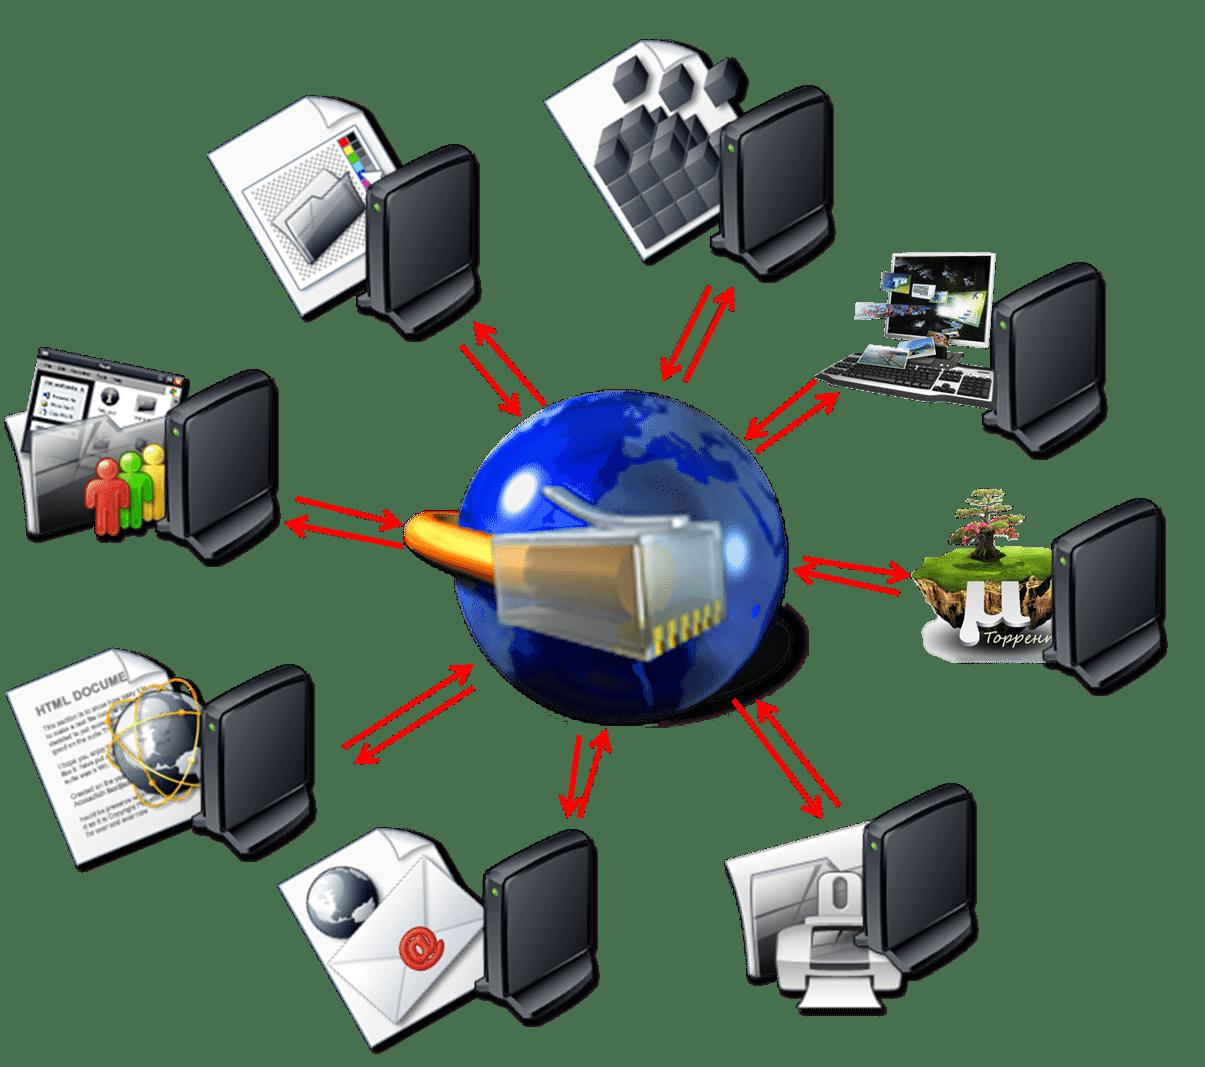 ITIC 7TI Sistemas Operativos II L-V 9-10